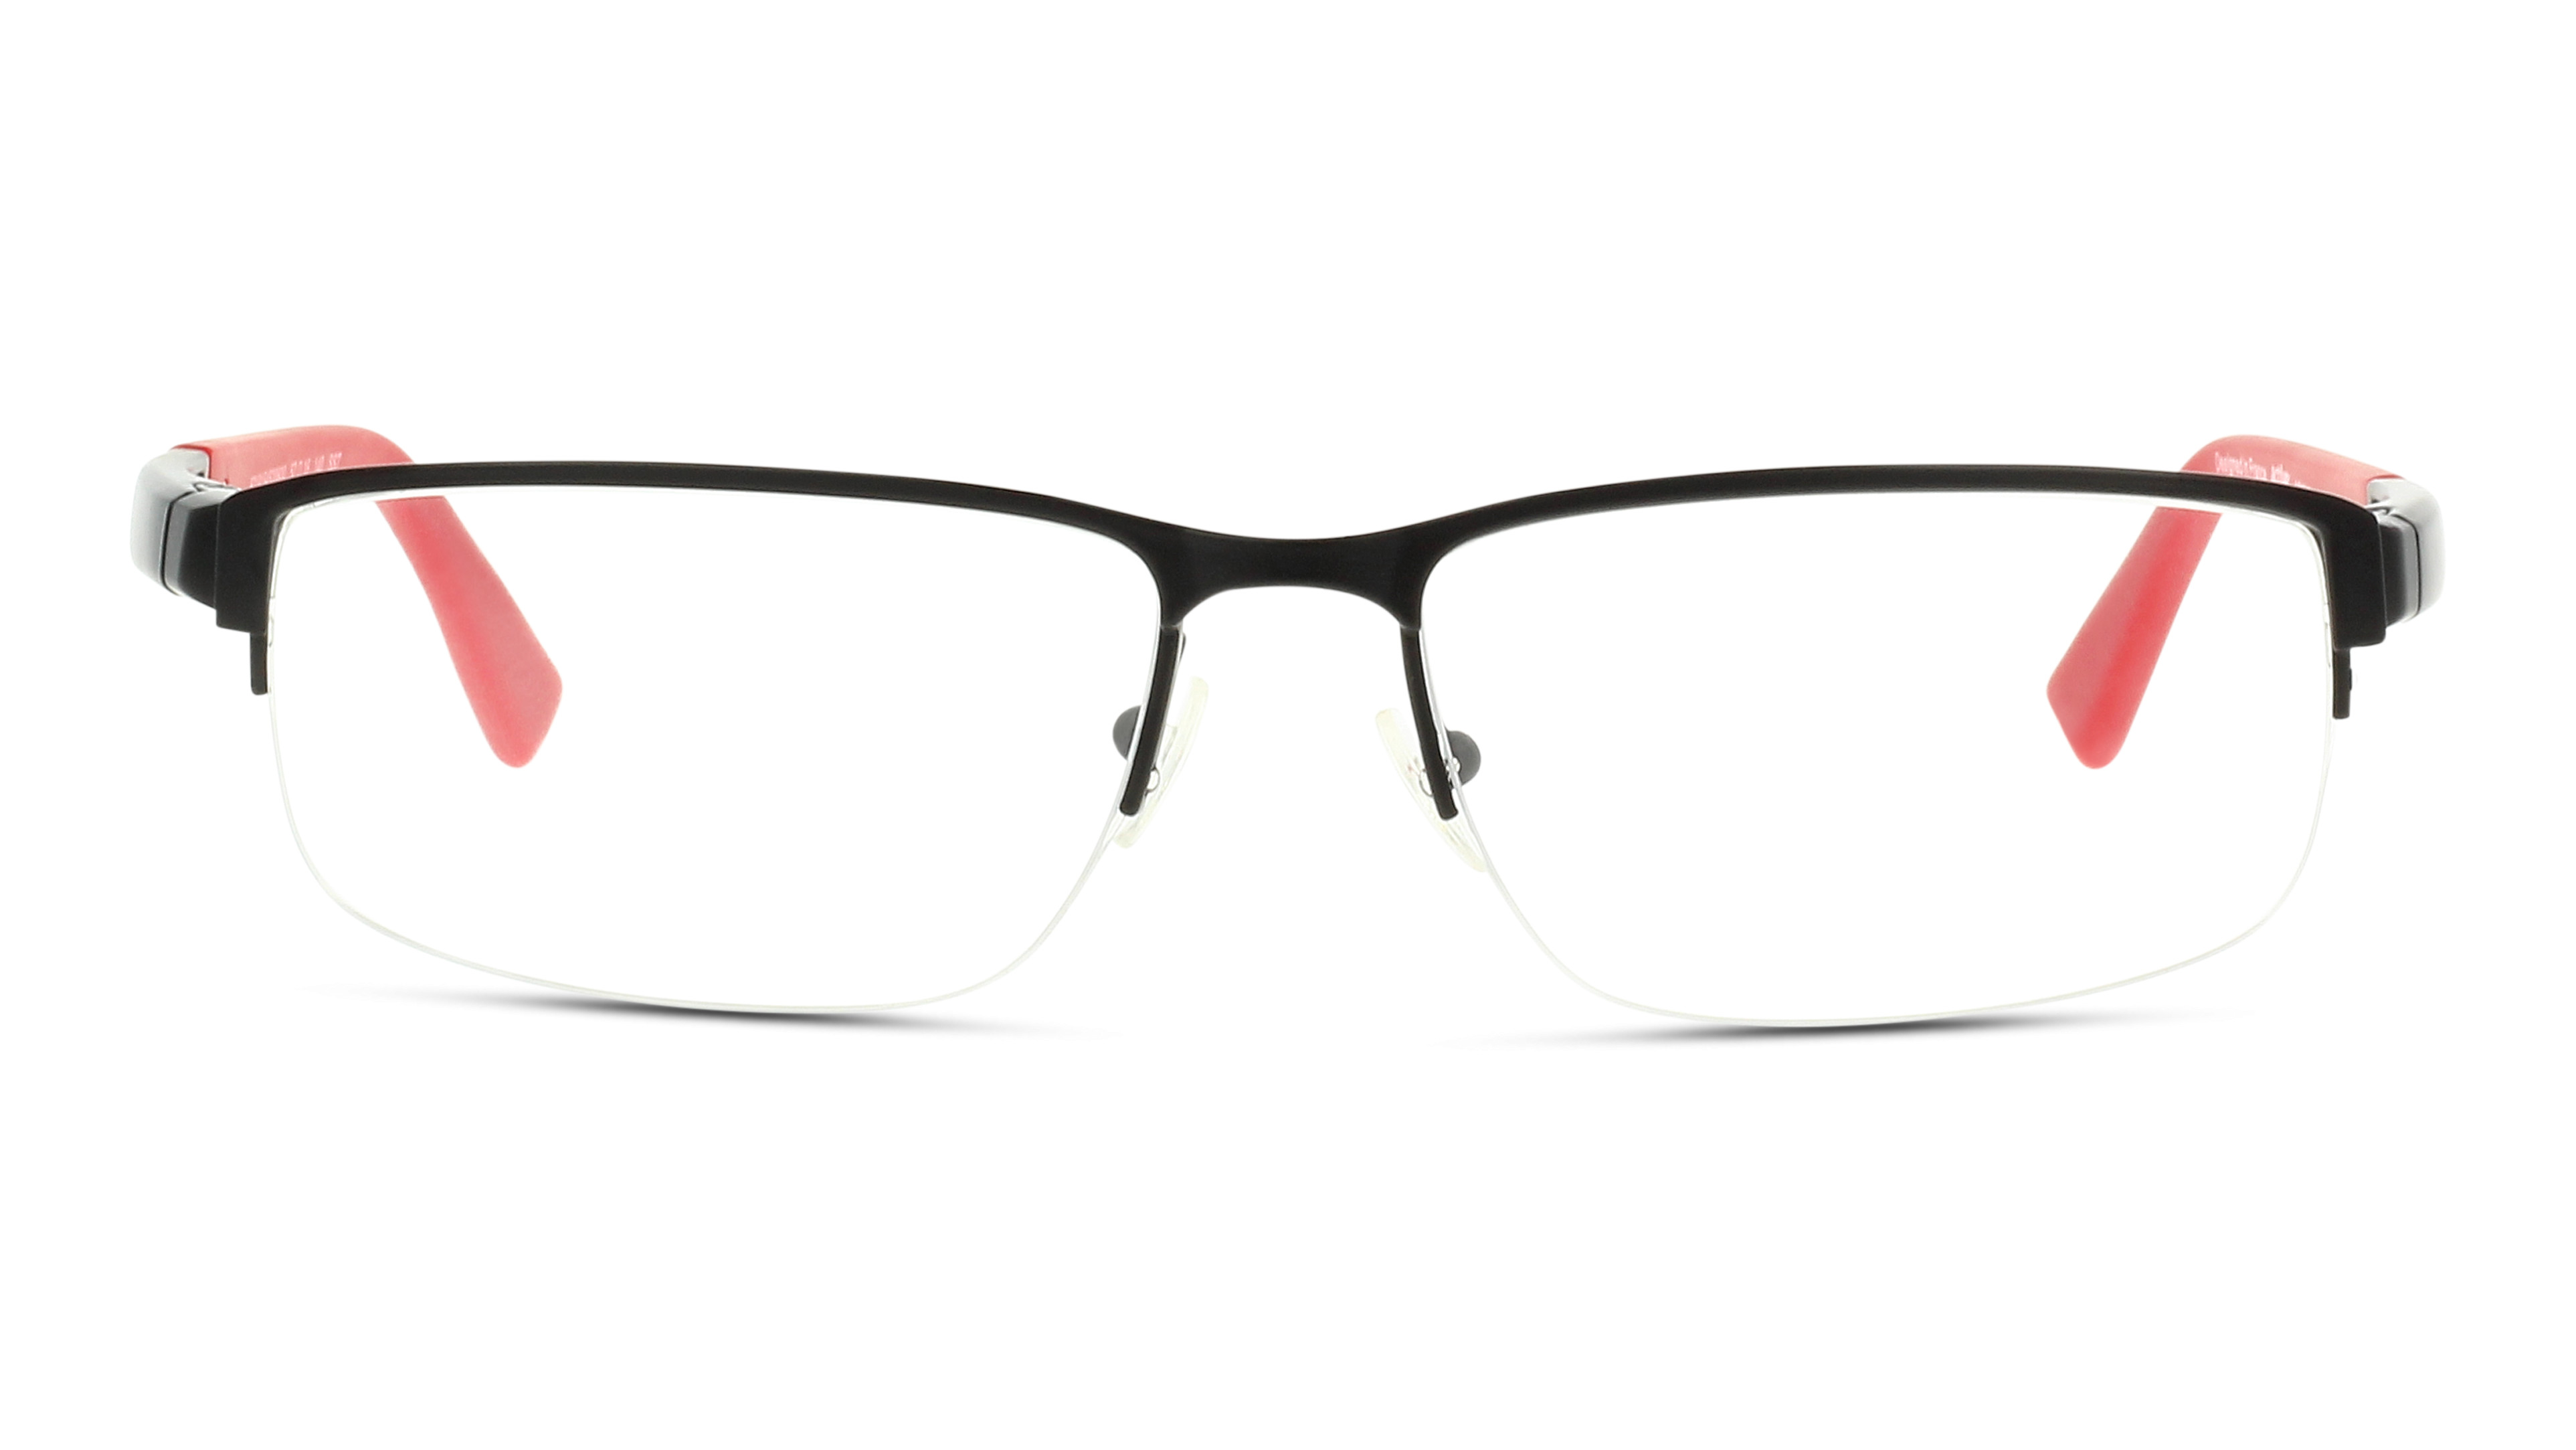 8719154520600-front-01-activ-ackm04-eyewear-black-red